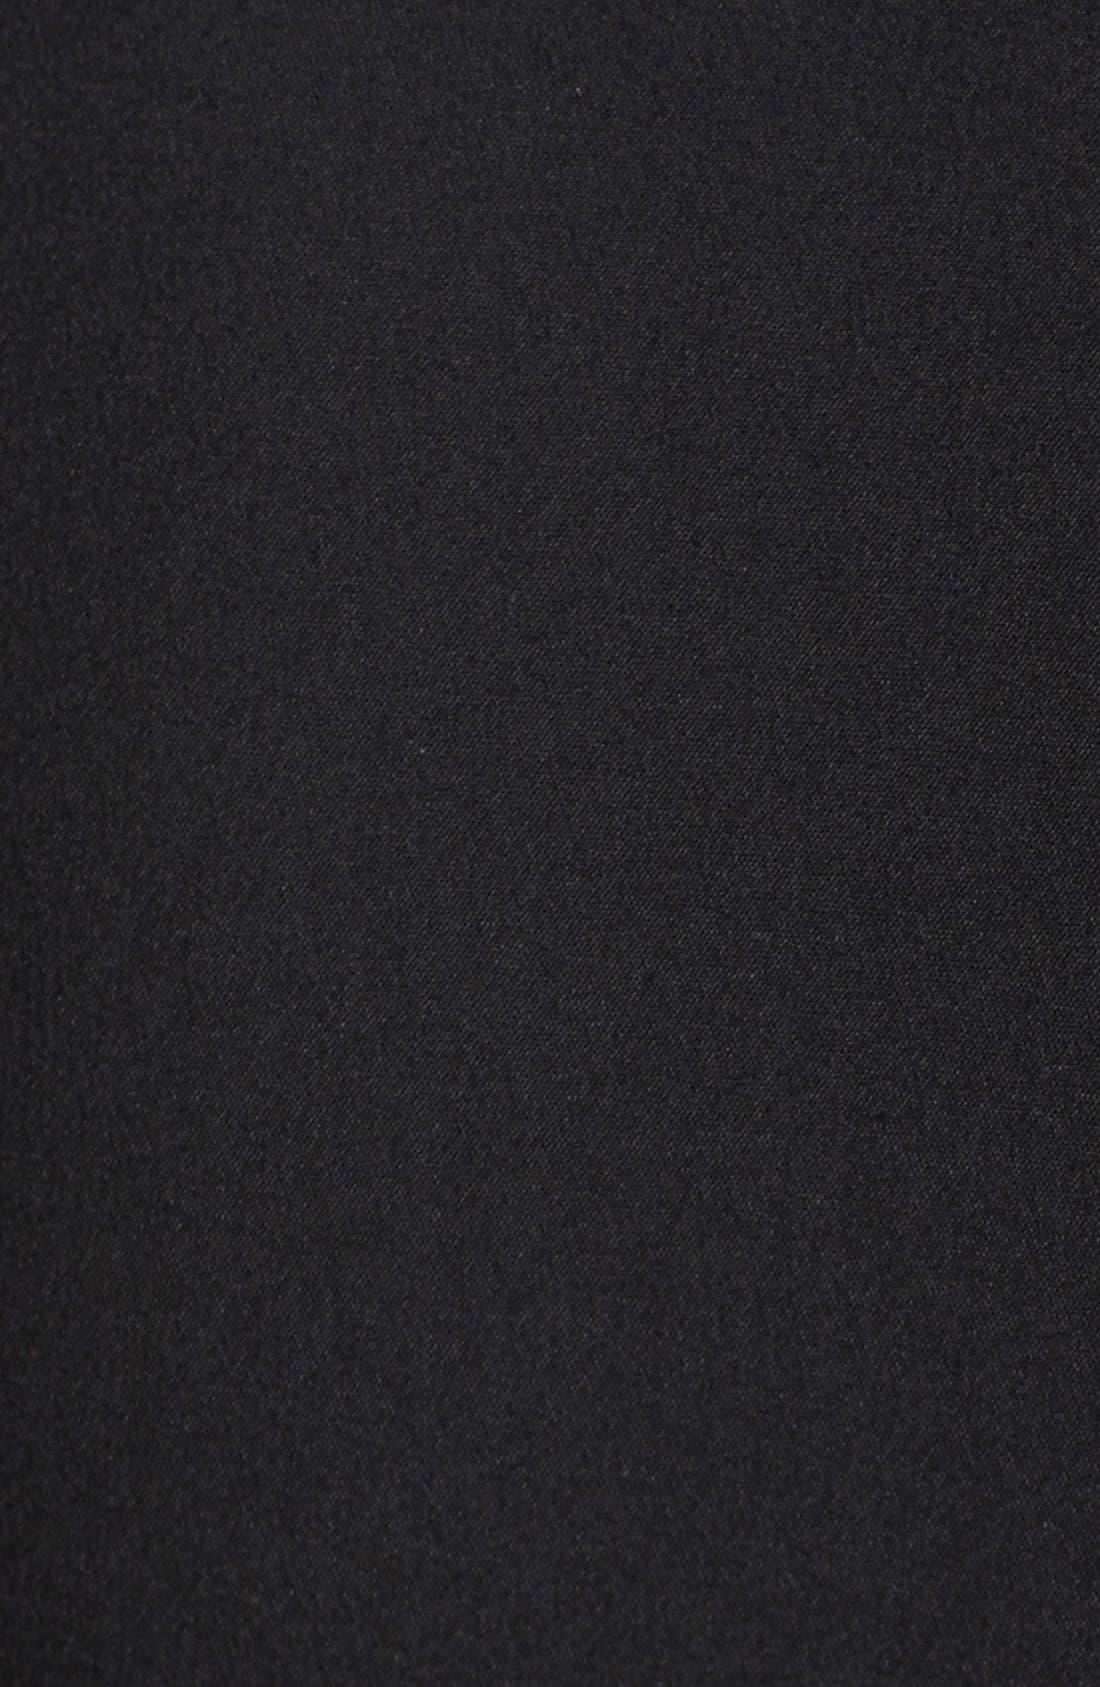 'Lolo' Stretch Sheath Dress,                             Alternate thumbnail 12, color,                             BLACK